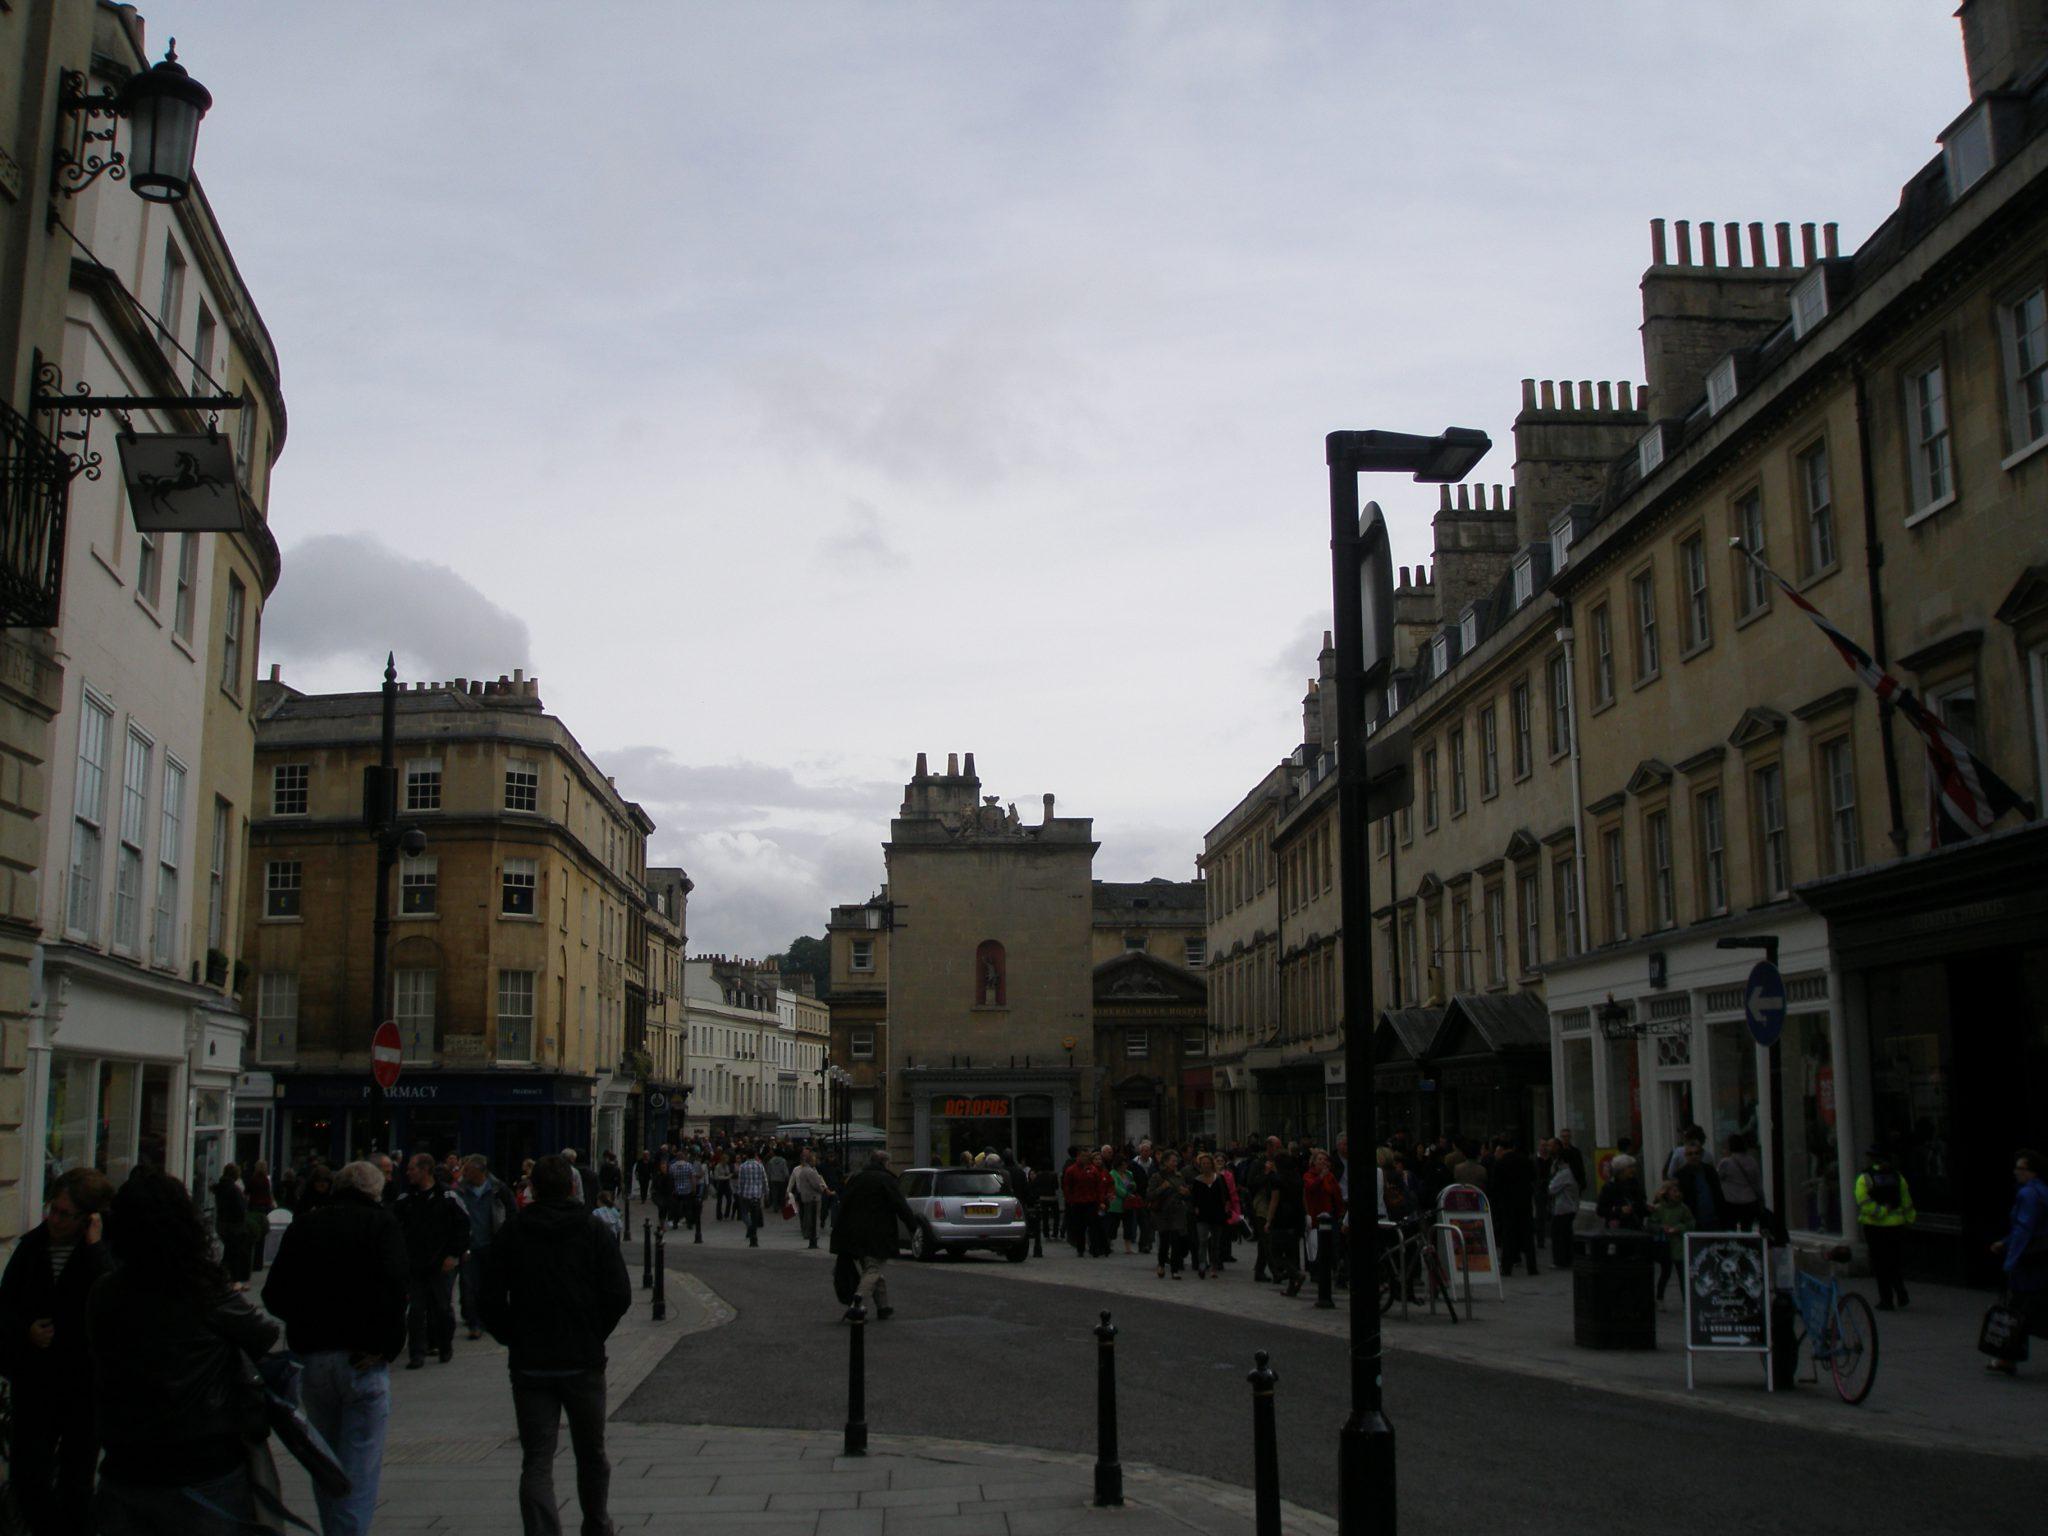 Lower end of Milsom Street